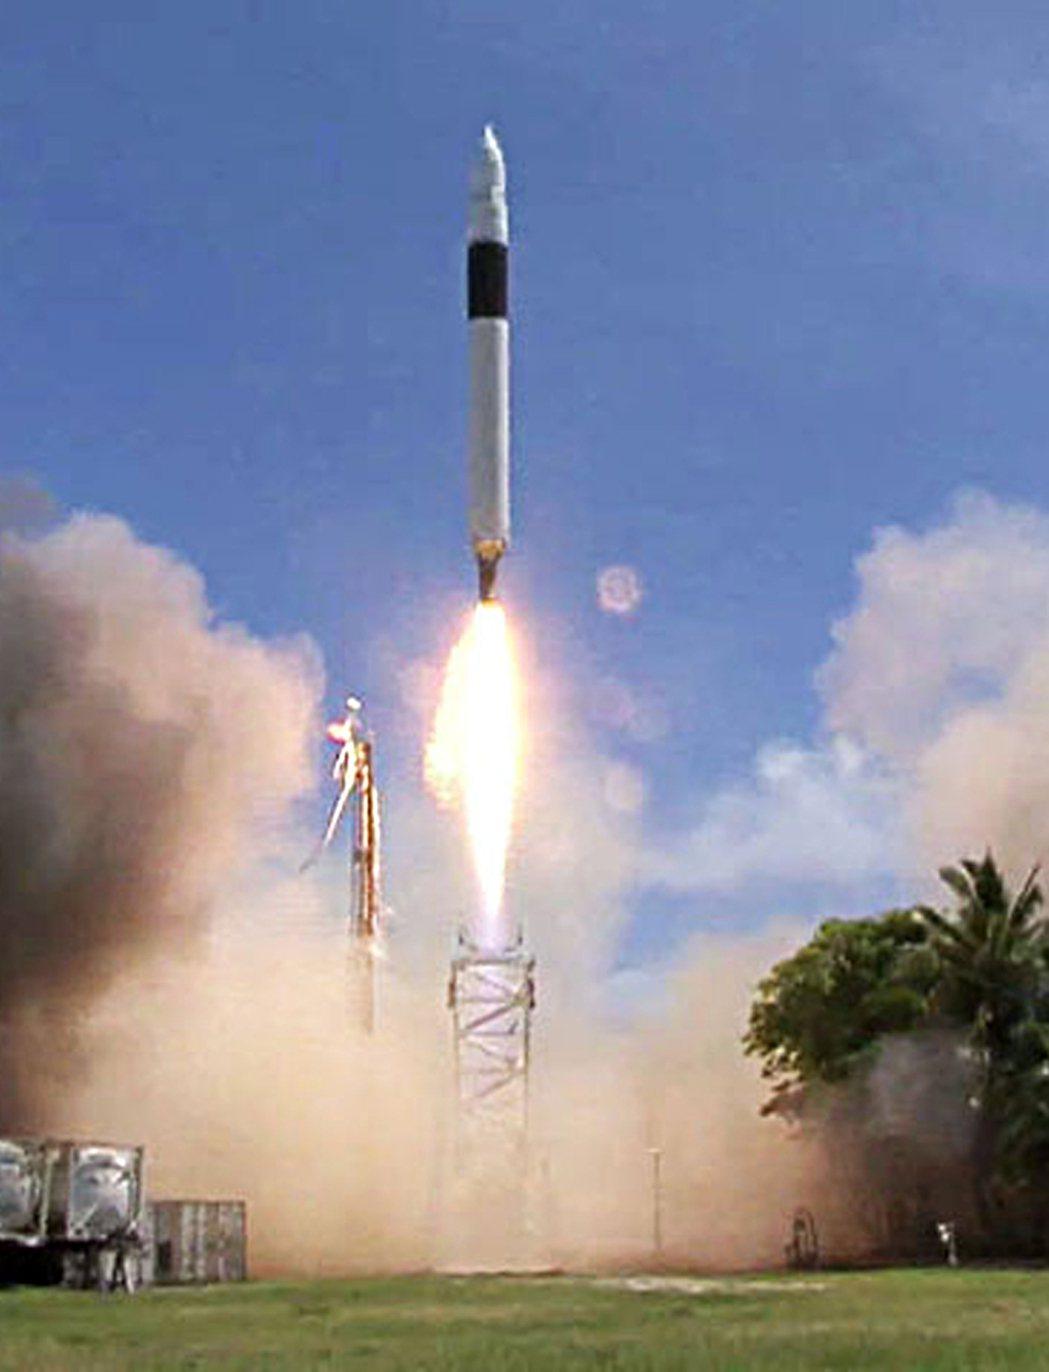 SpaceX旗下最早發射火箭獵鷹1號,如今成功發射滿11周年。 (法新社)